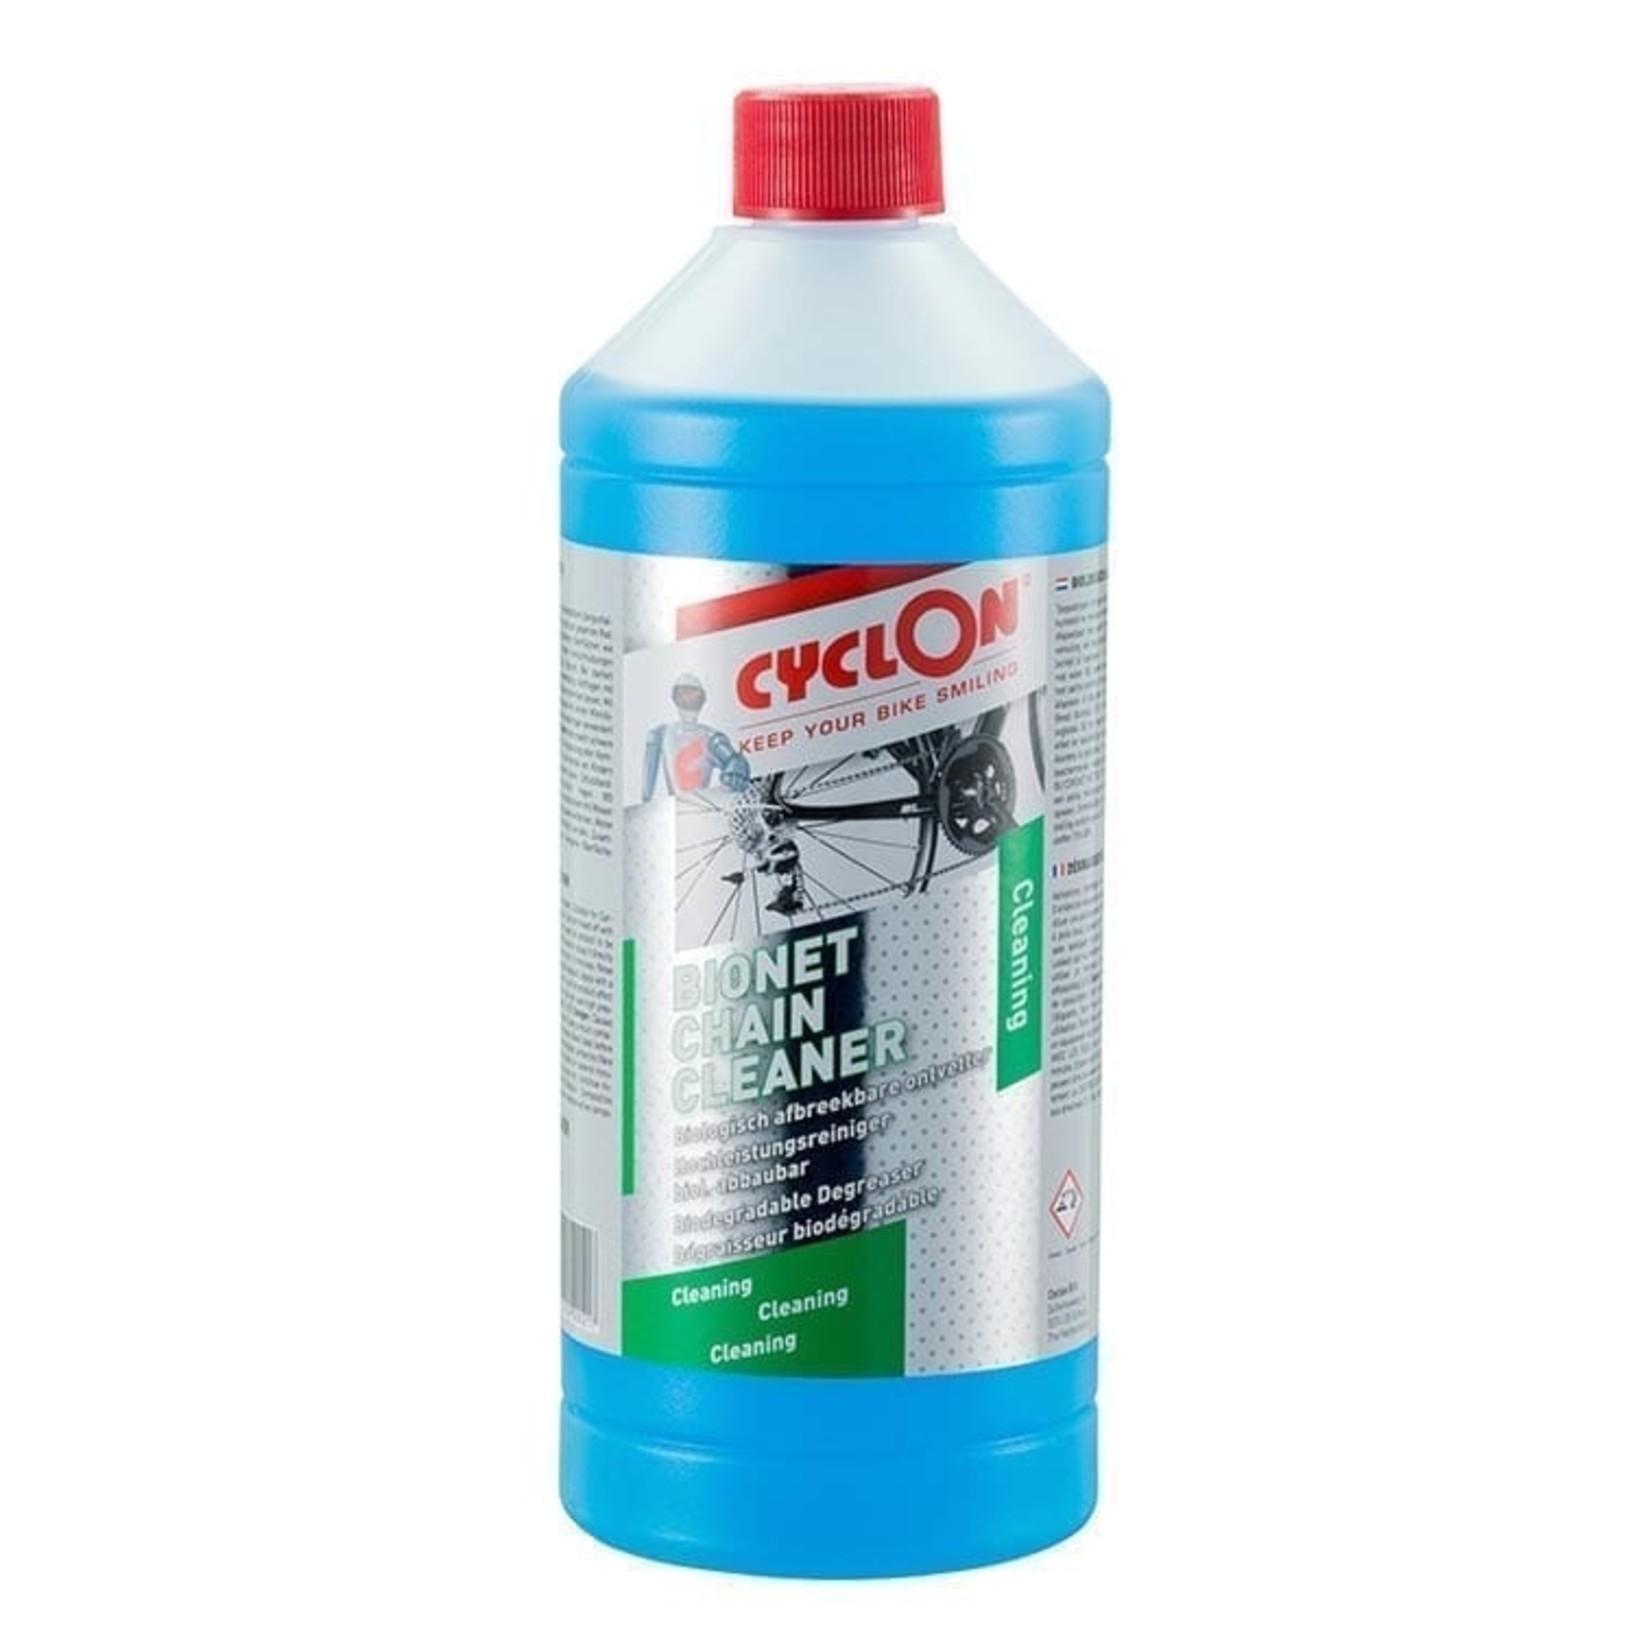 CYCLON CYCLON BIONET CHAIN CLEANER 1000ML